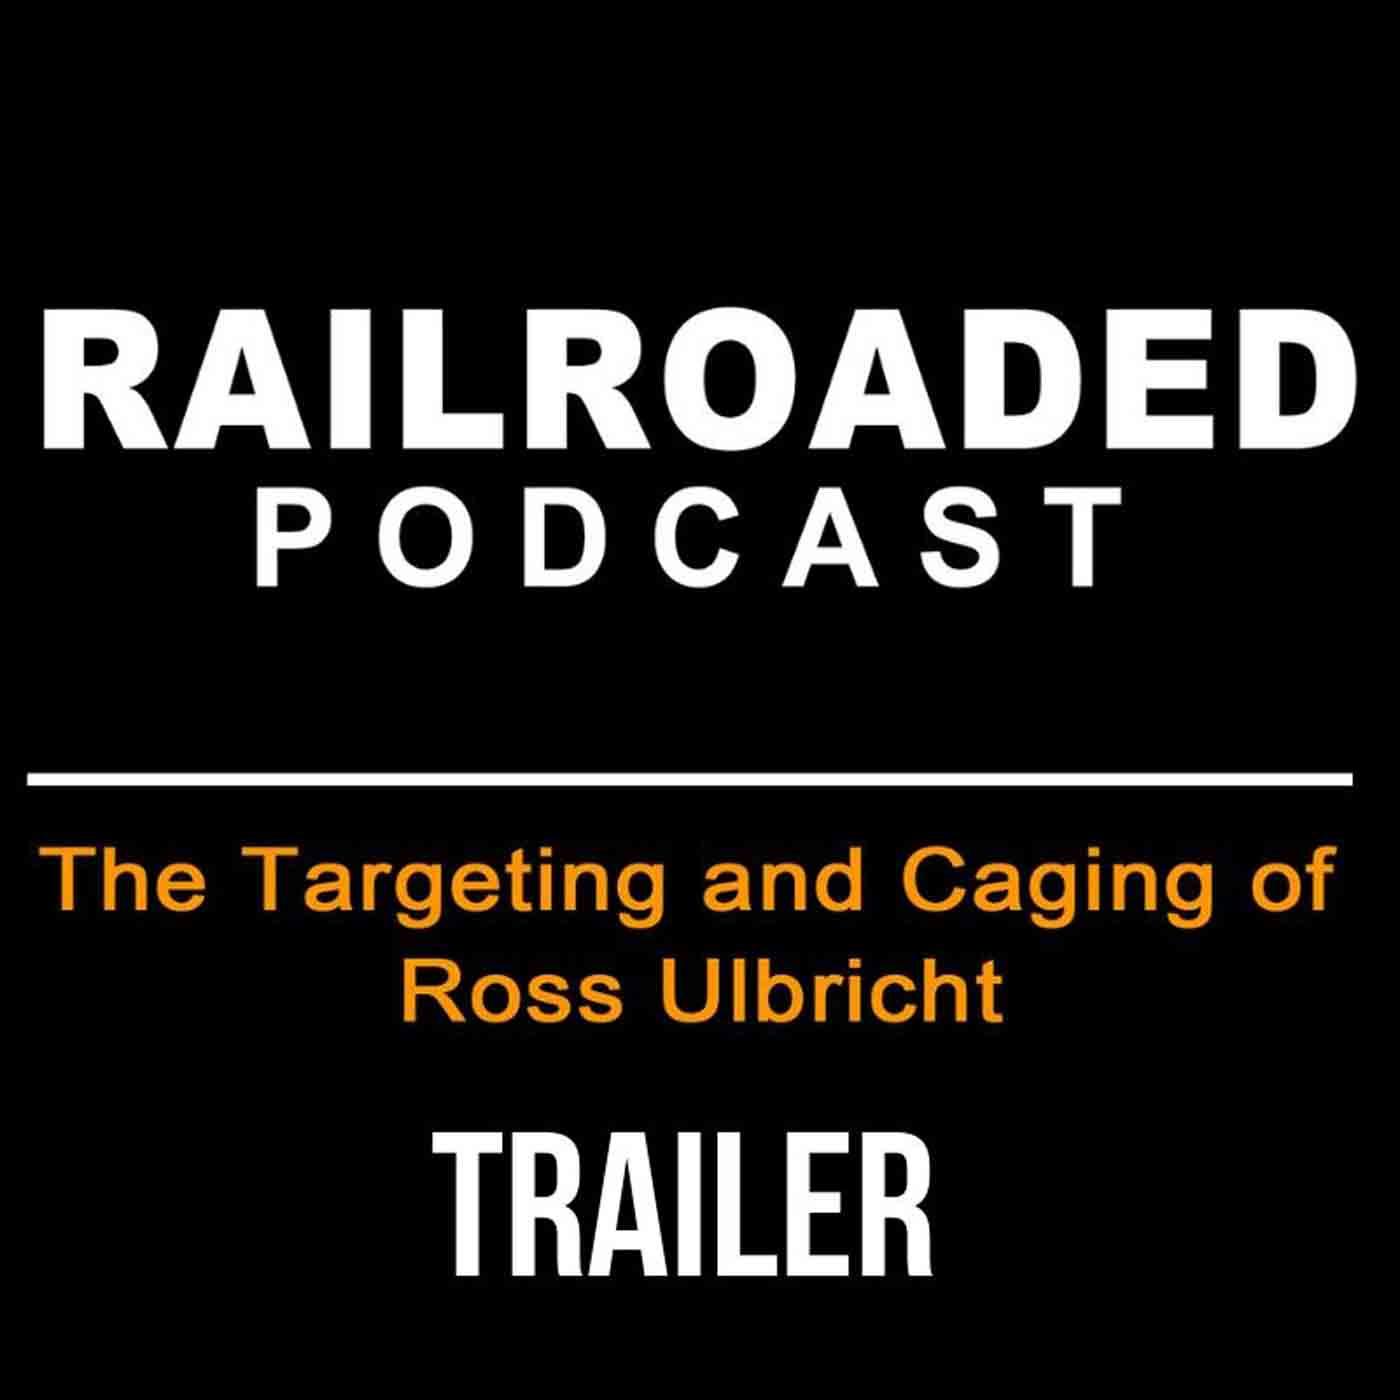 Artwork for podcast Railroaded